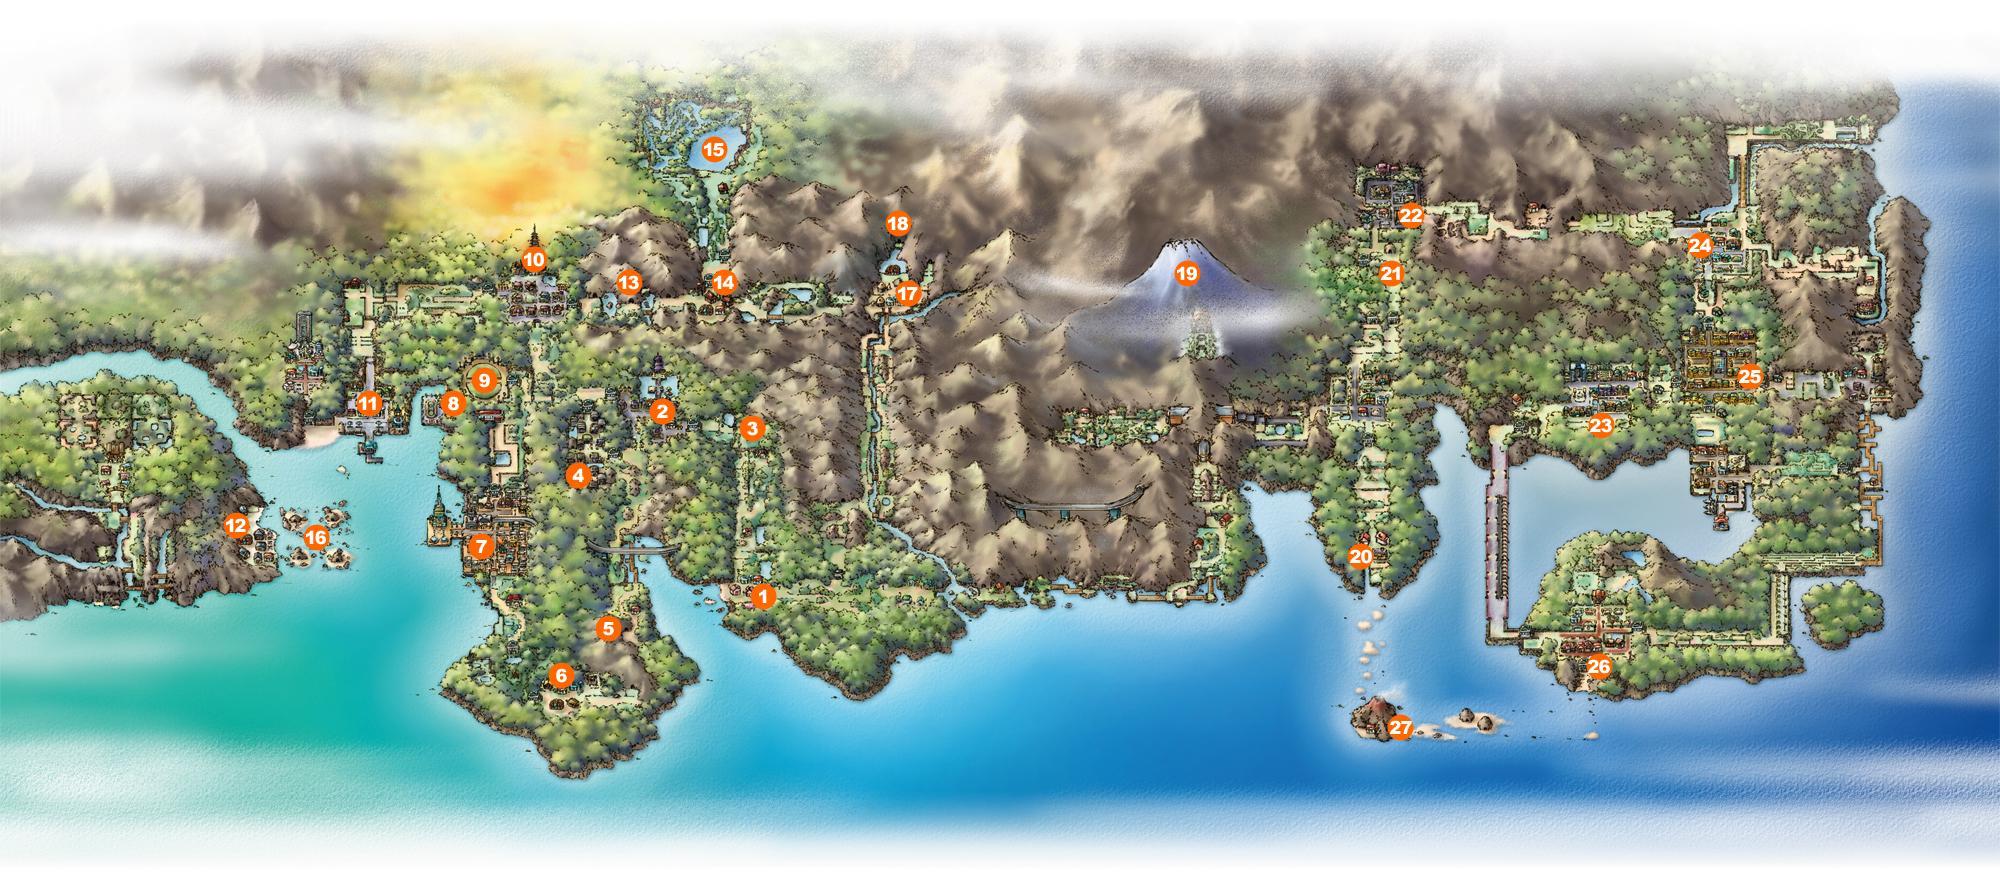 Pokemon Heartgold Soulsilver Review Gamesradar